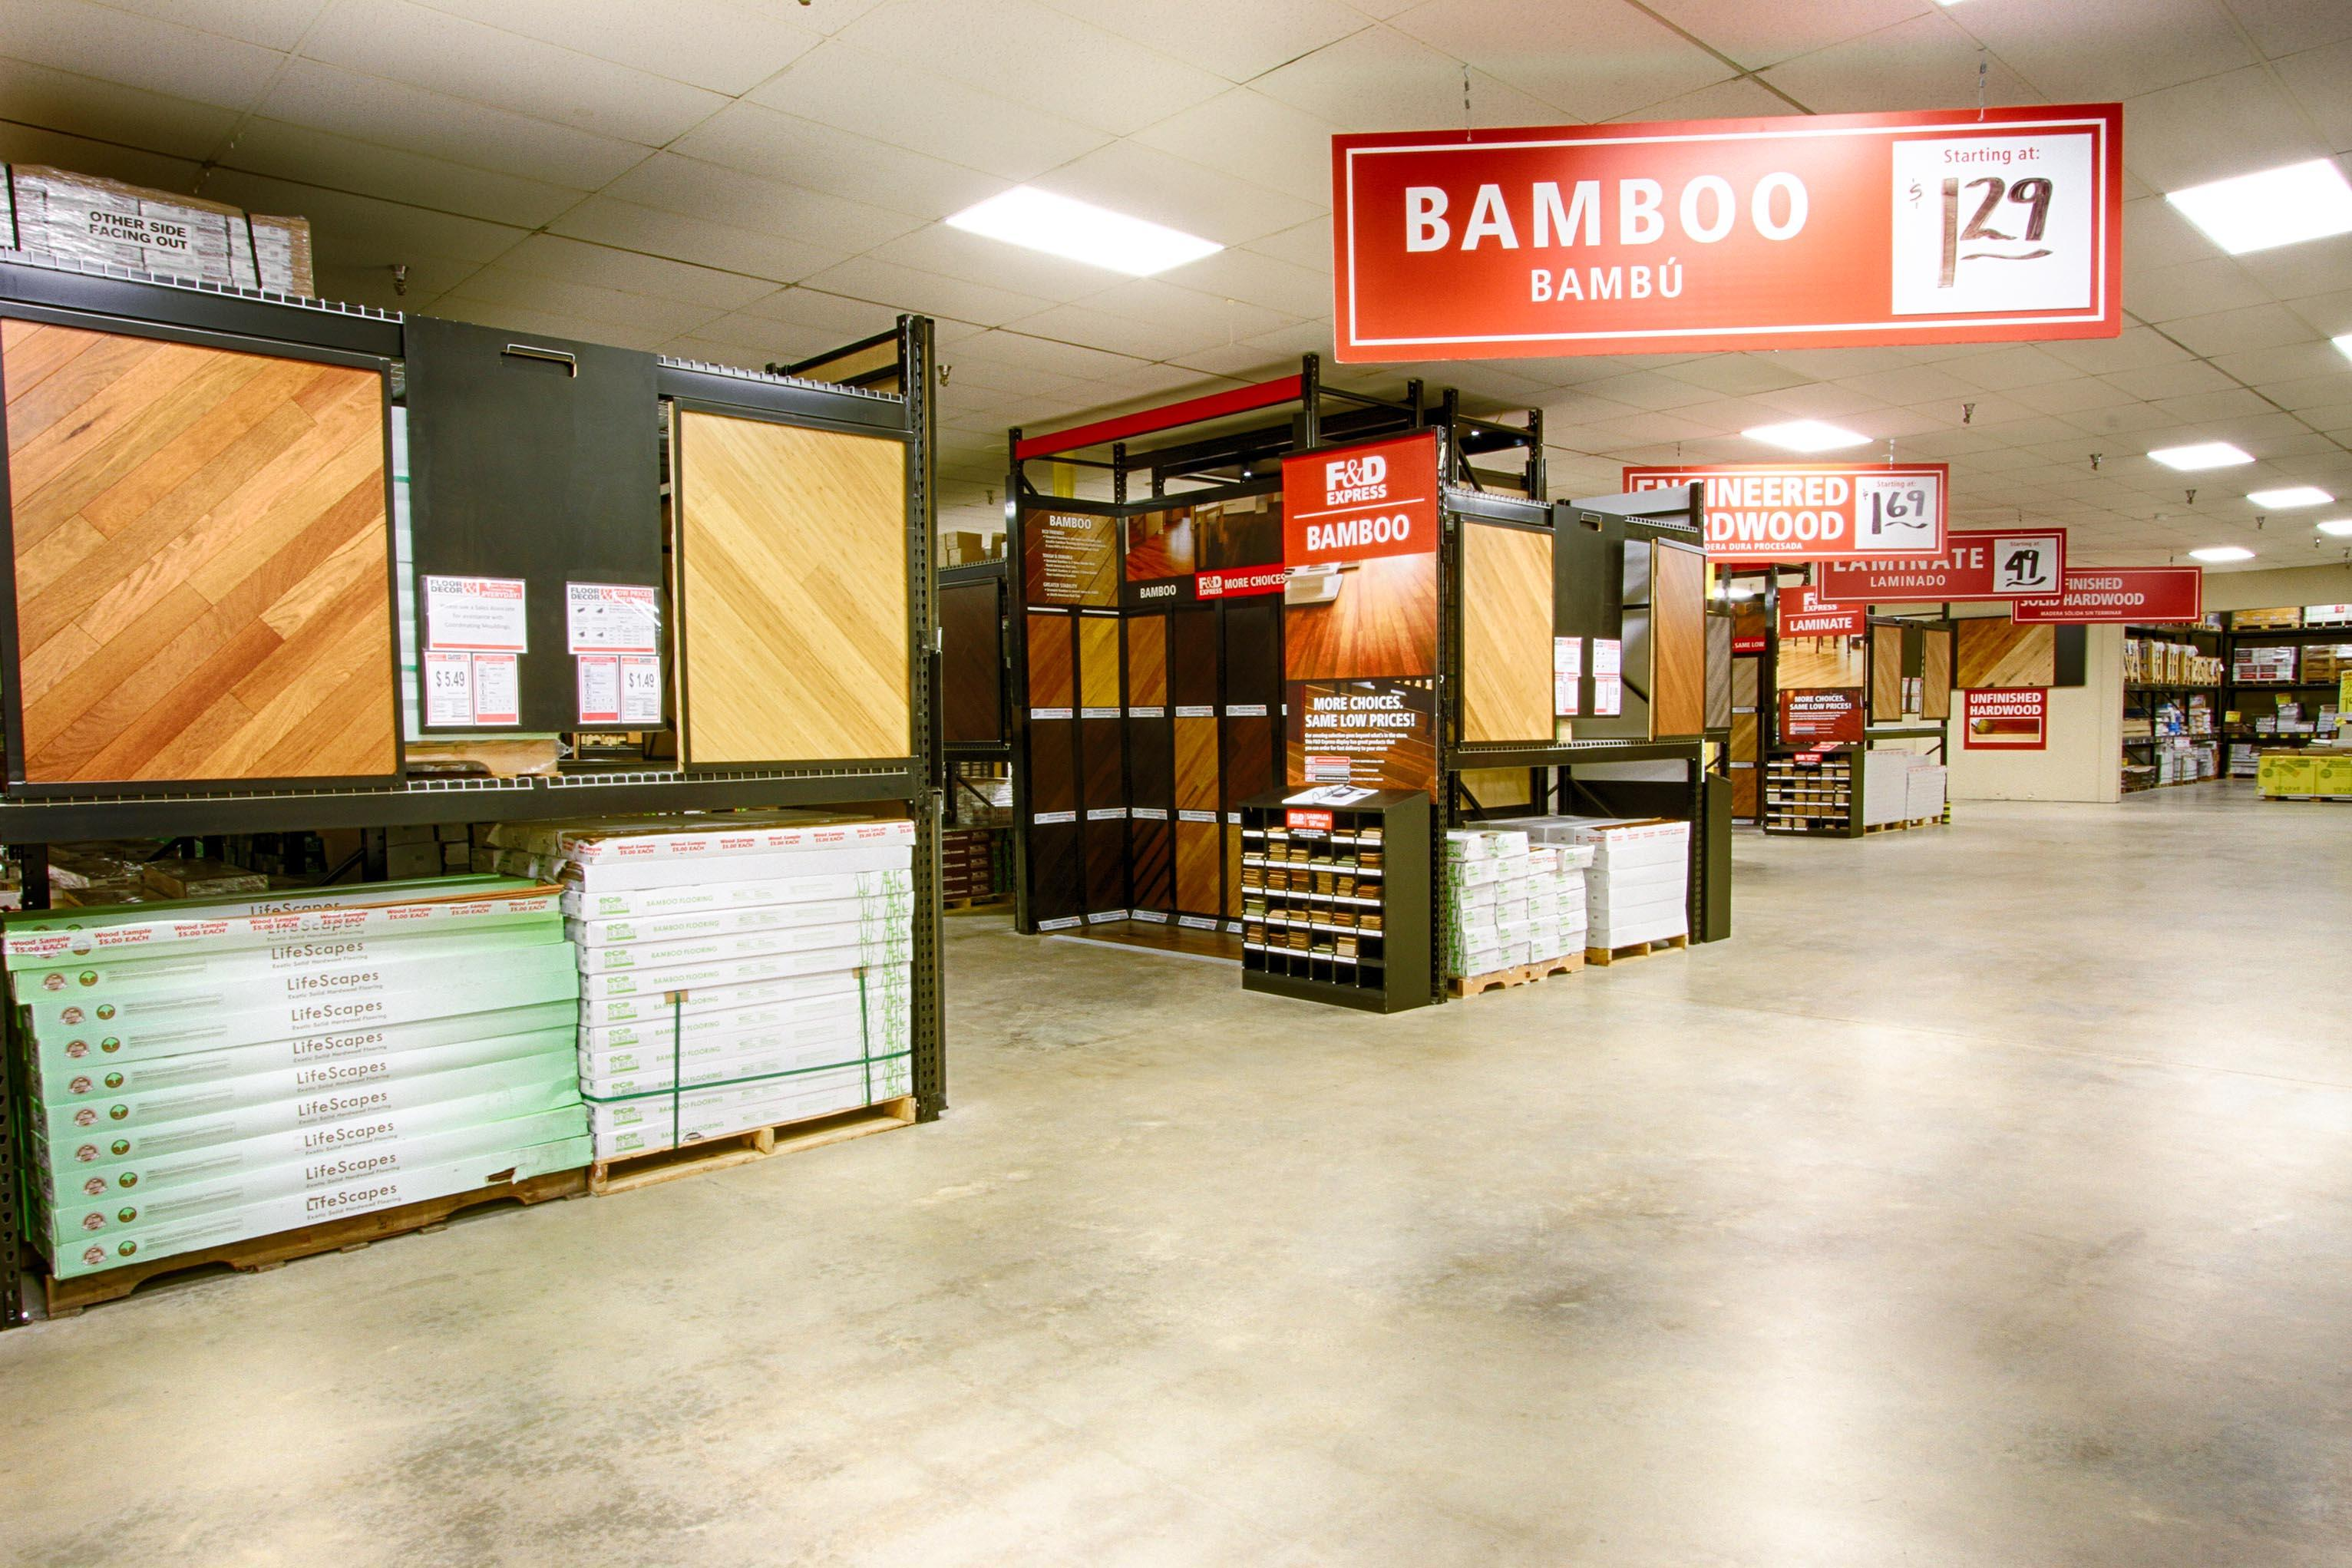 Floor Decor 5432 Glenside Dr Richmond Va Tile Ceramic Contractors Dealers Mapquest